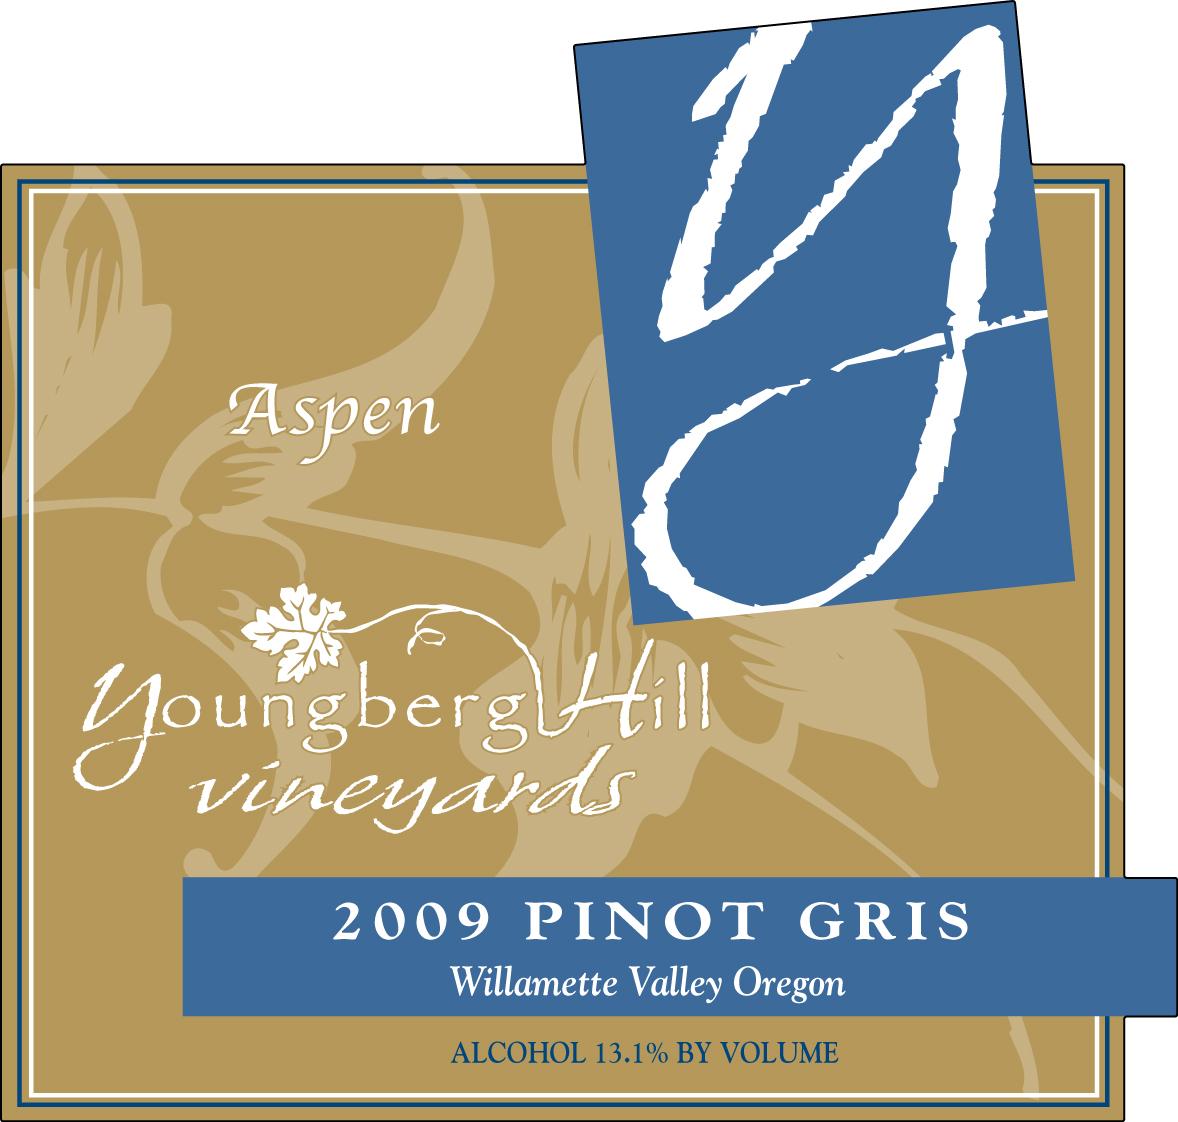 Oregon Wine Releases 1